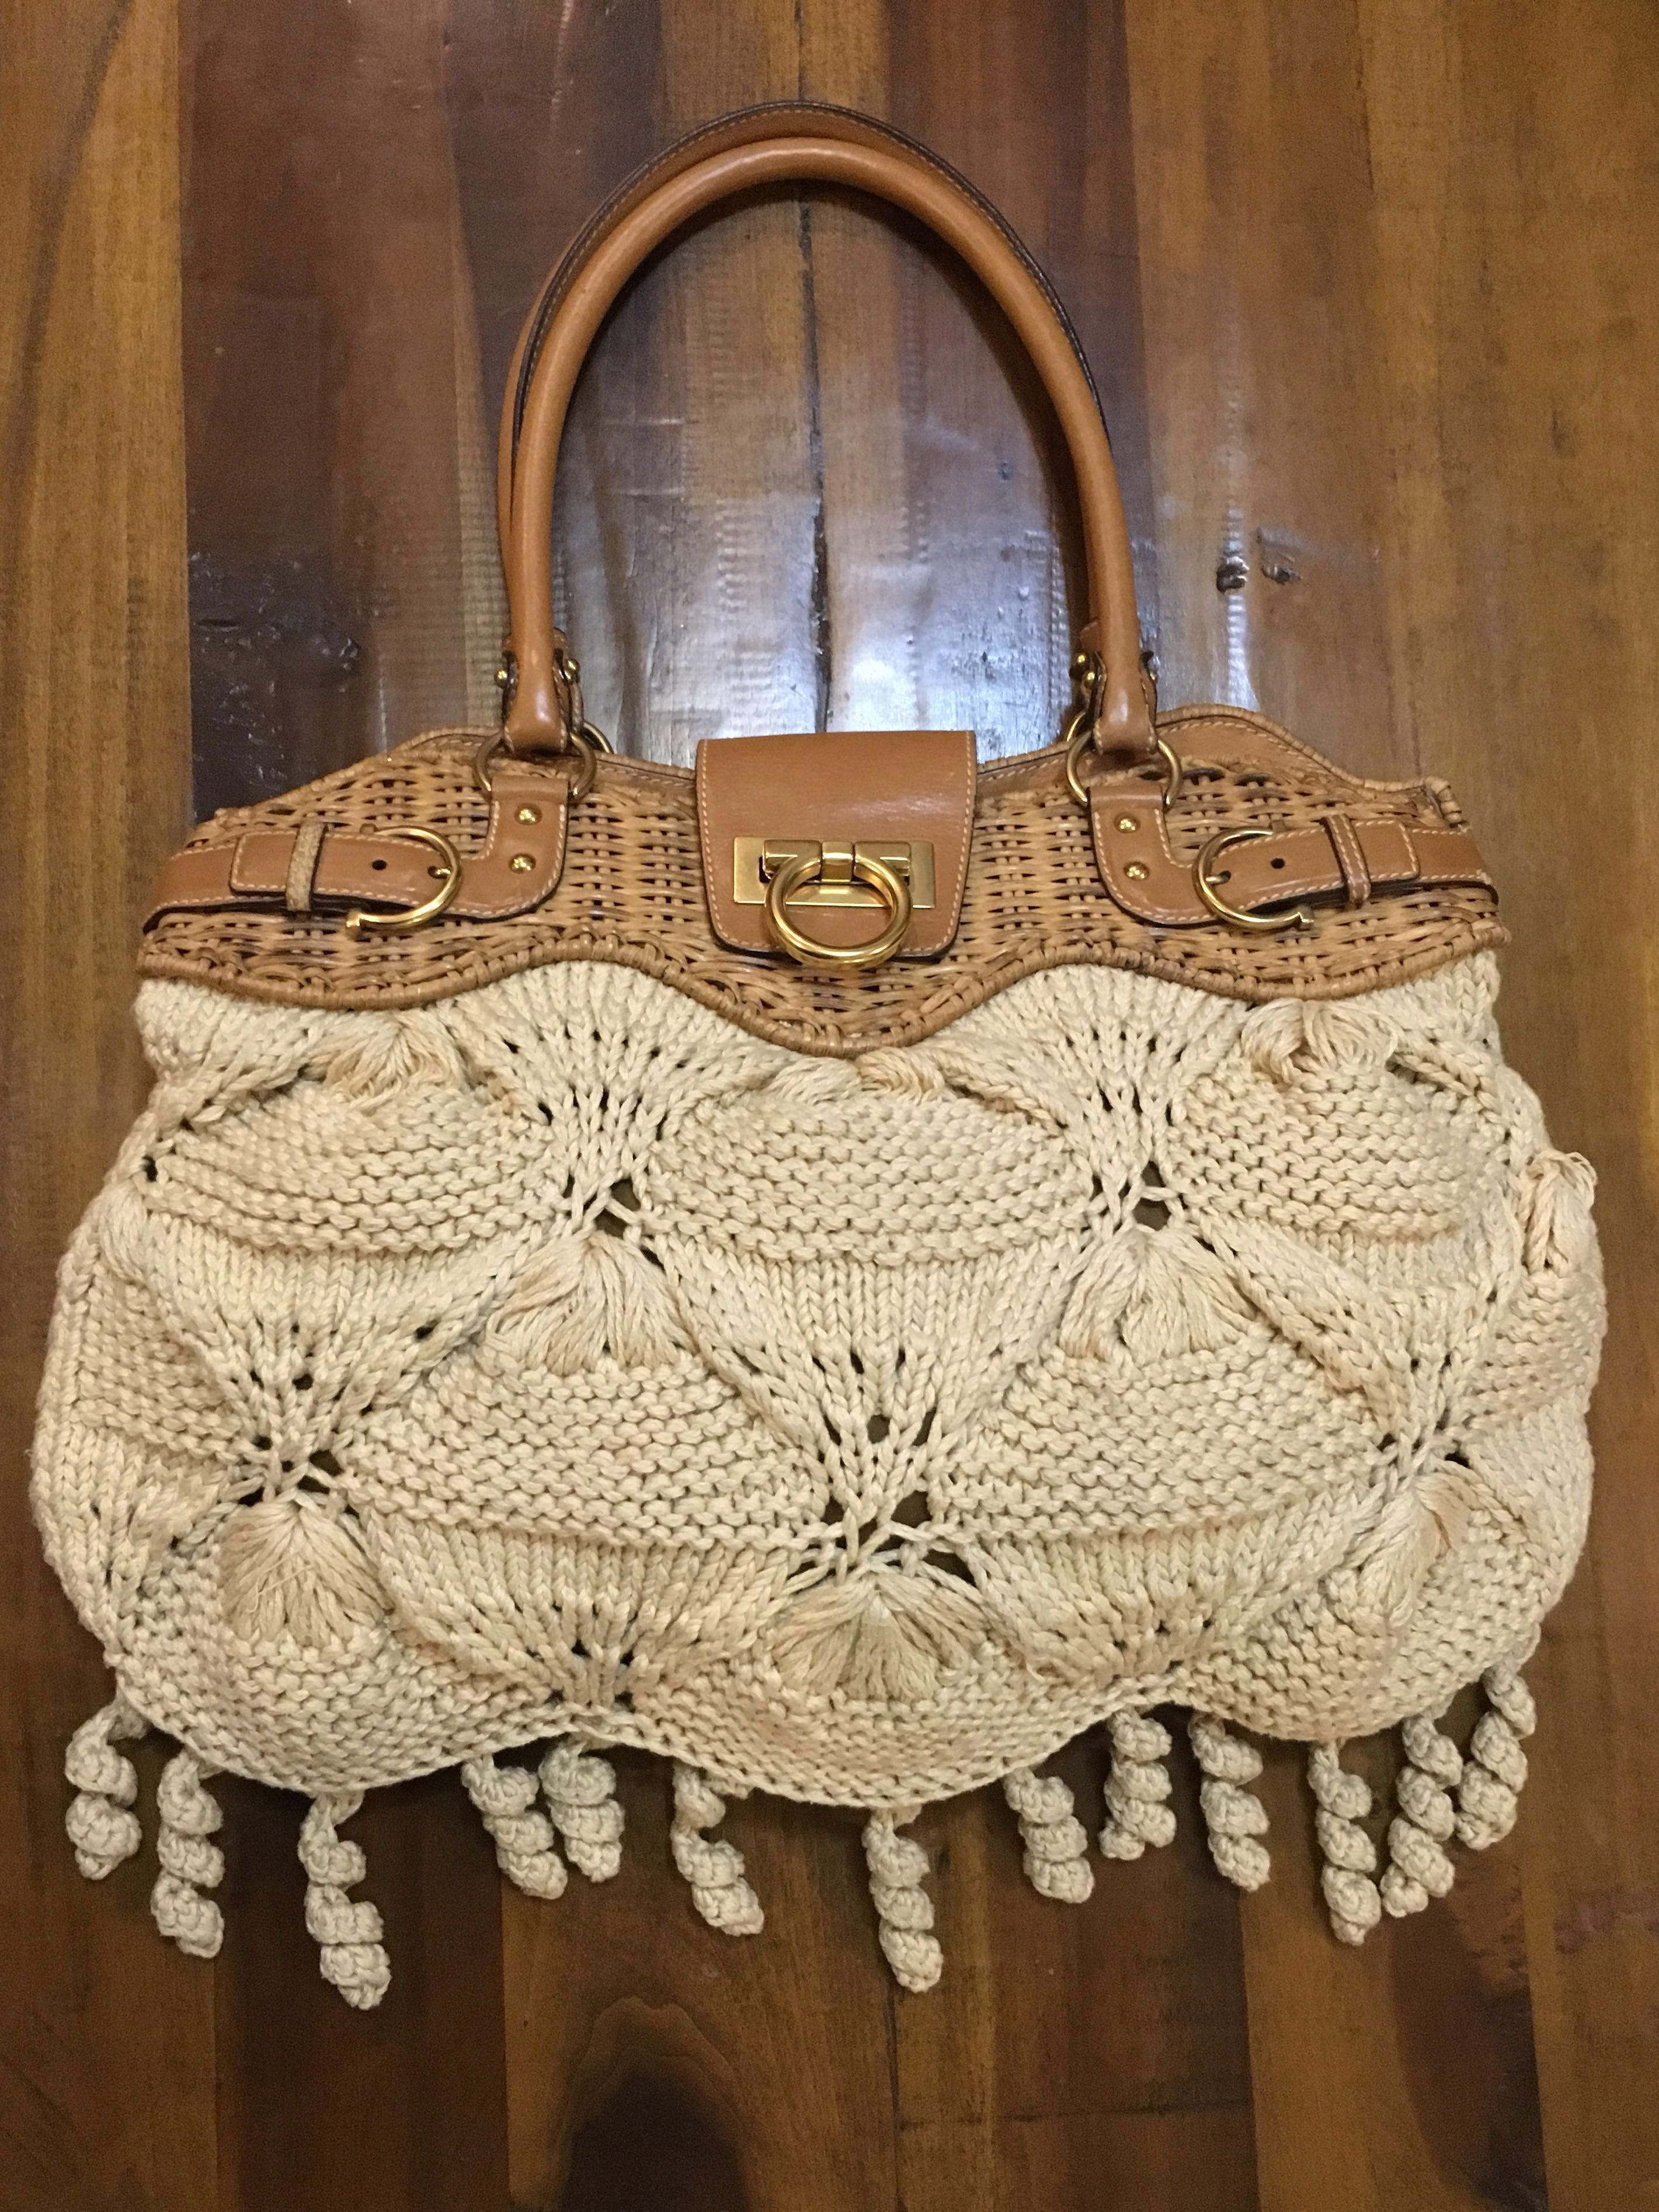 Salvatore Ferragamo Crochet Bag, Women s Fashion, Bags   Wallets, Handbags  on Carousell c27b6bf0f8